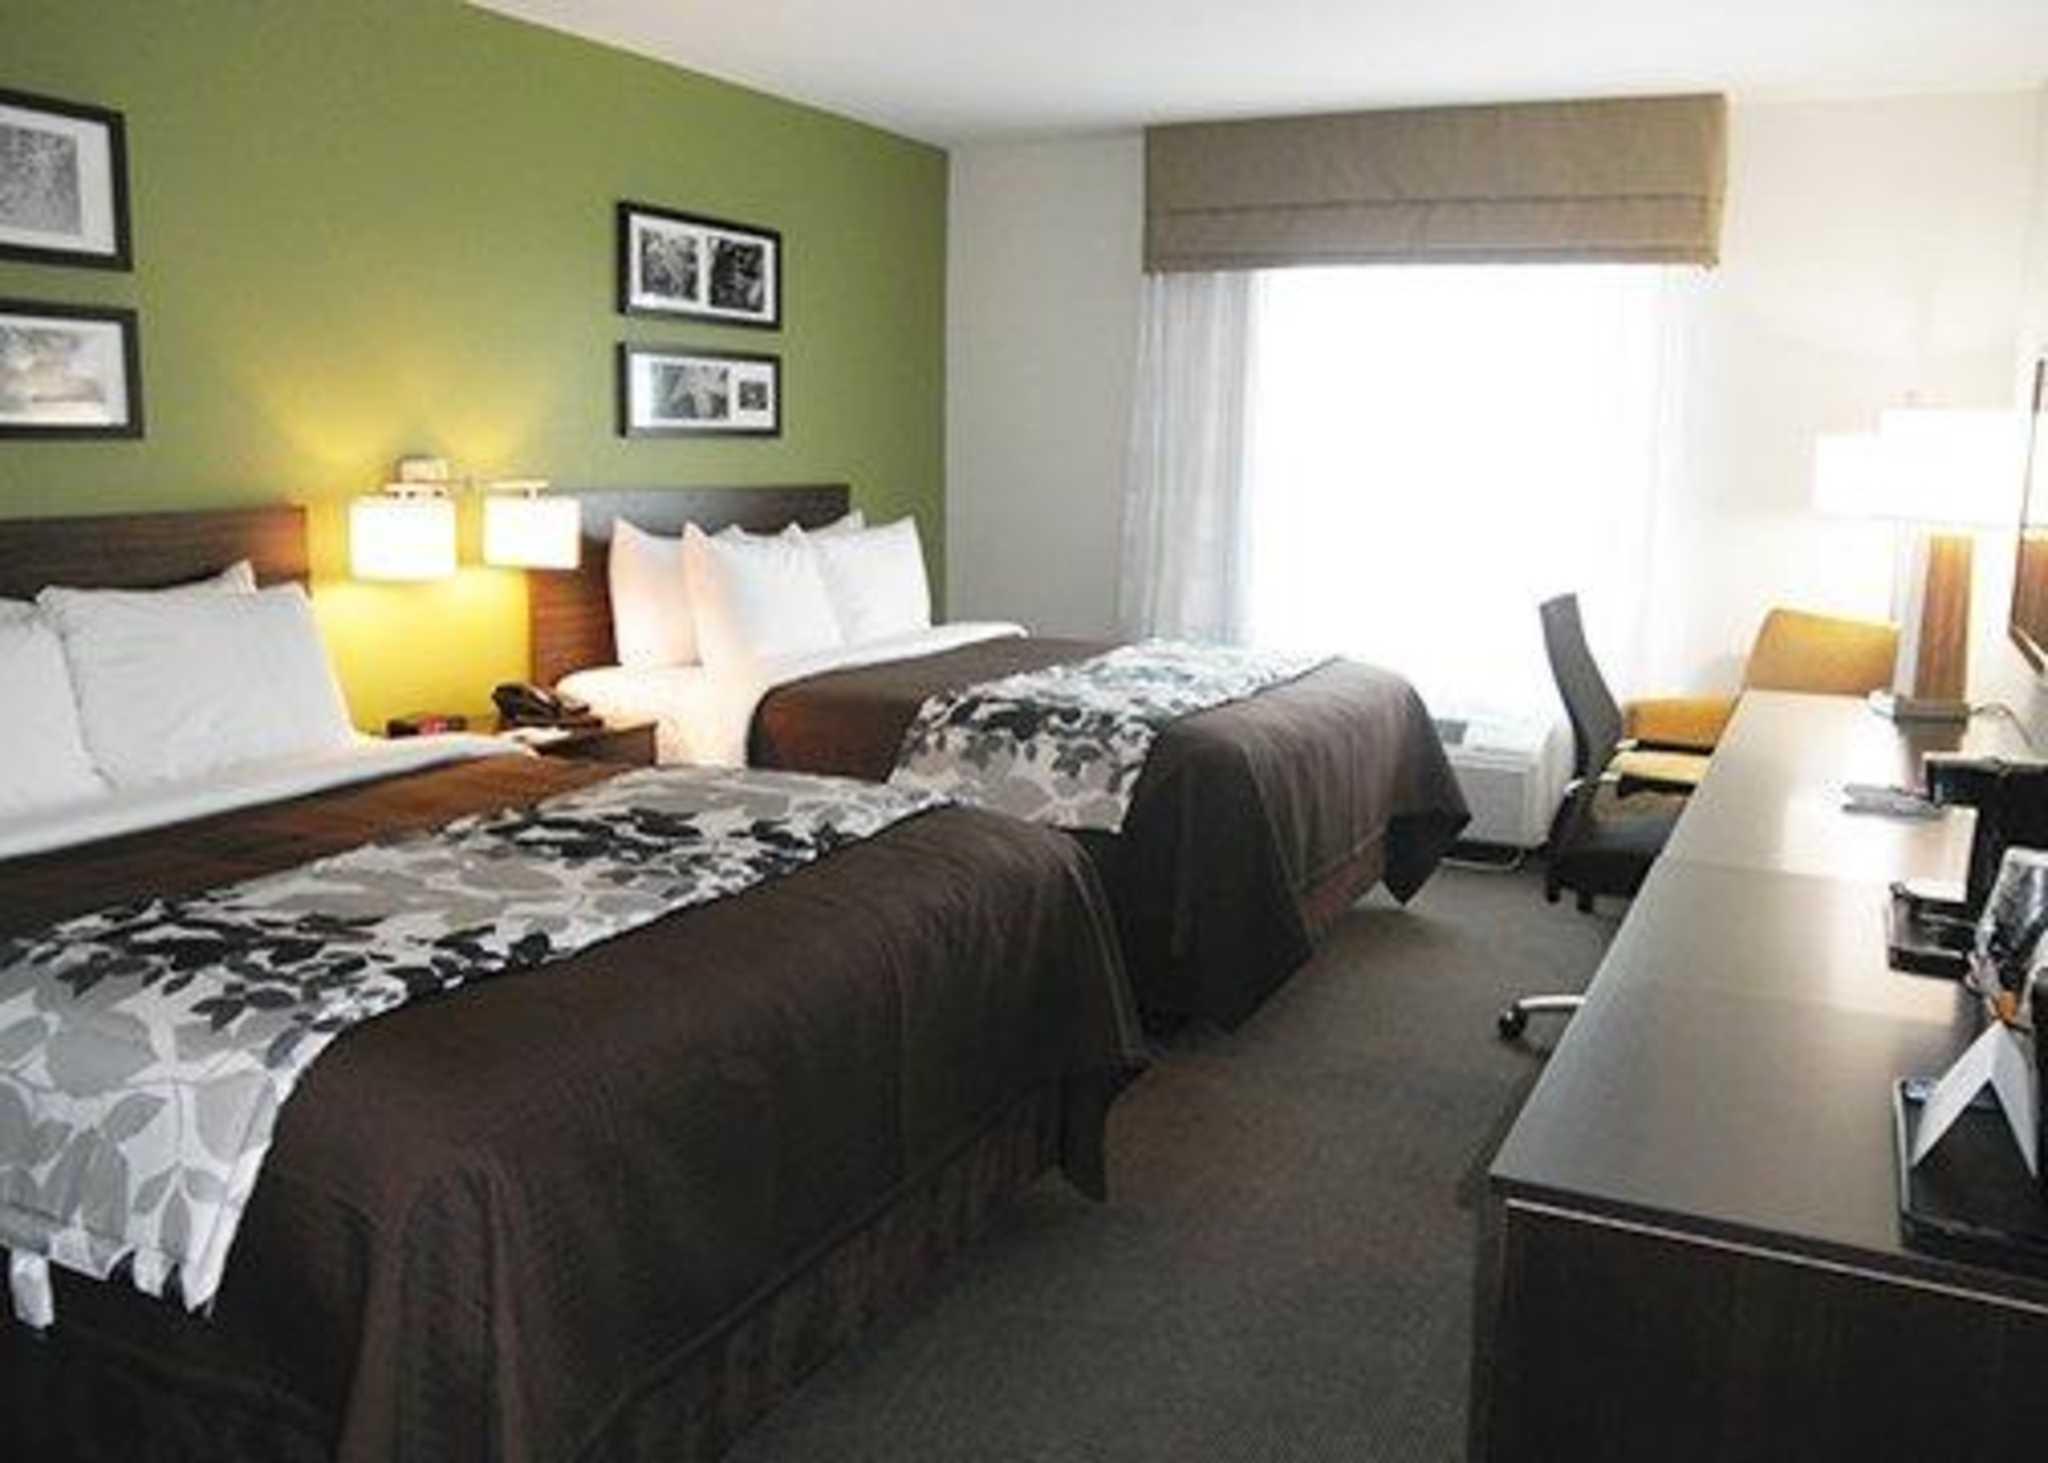 Sleep Inn & Suites Belmont / St. Clairsville image 2